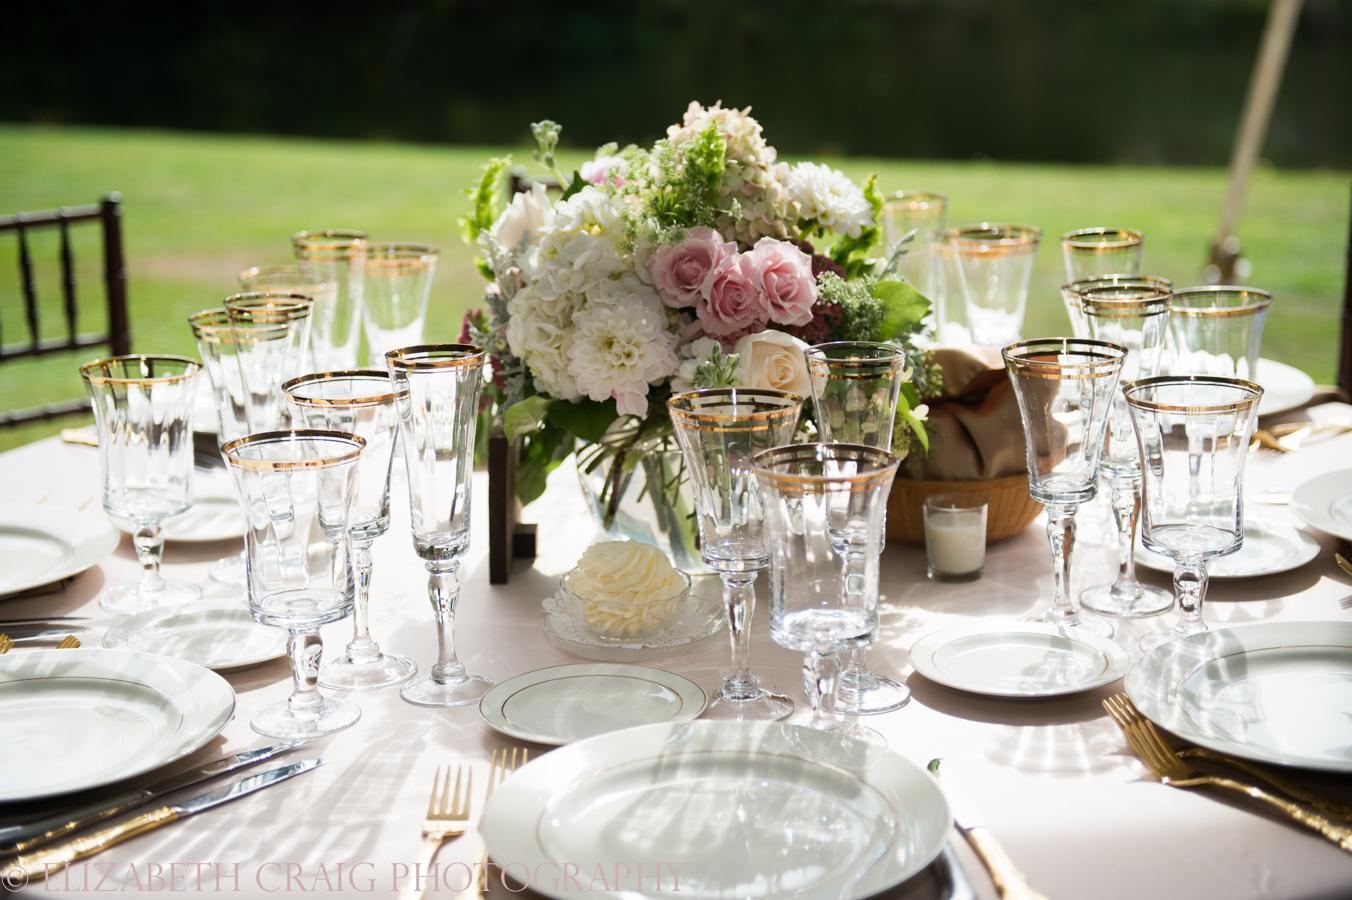 Dubois Brockway St. Marys PA Weddings-0136